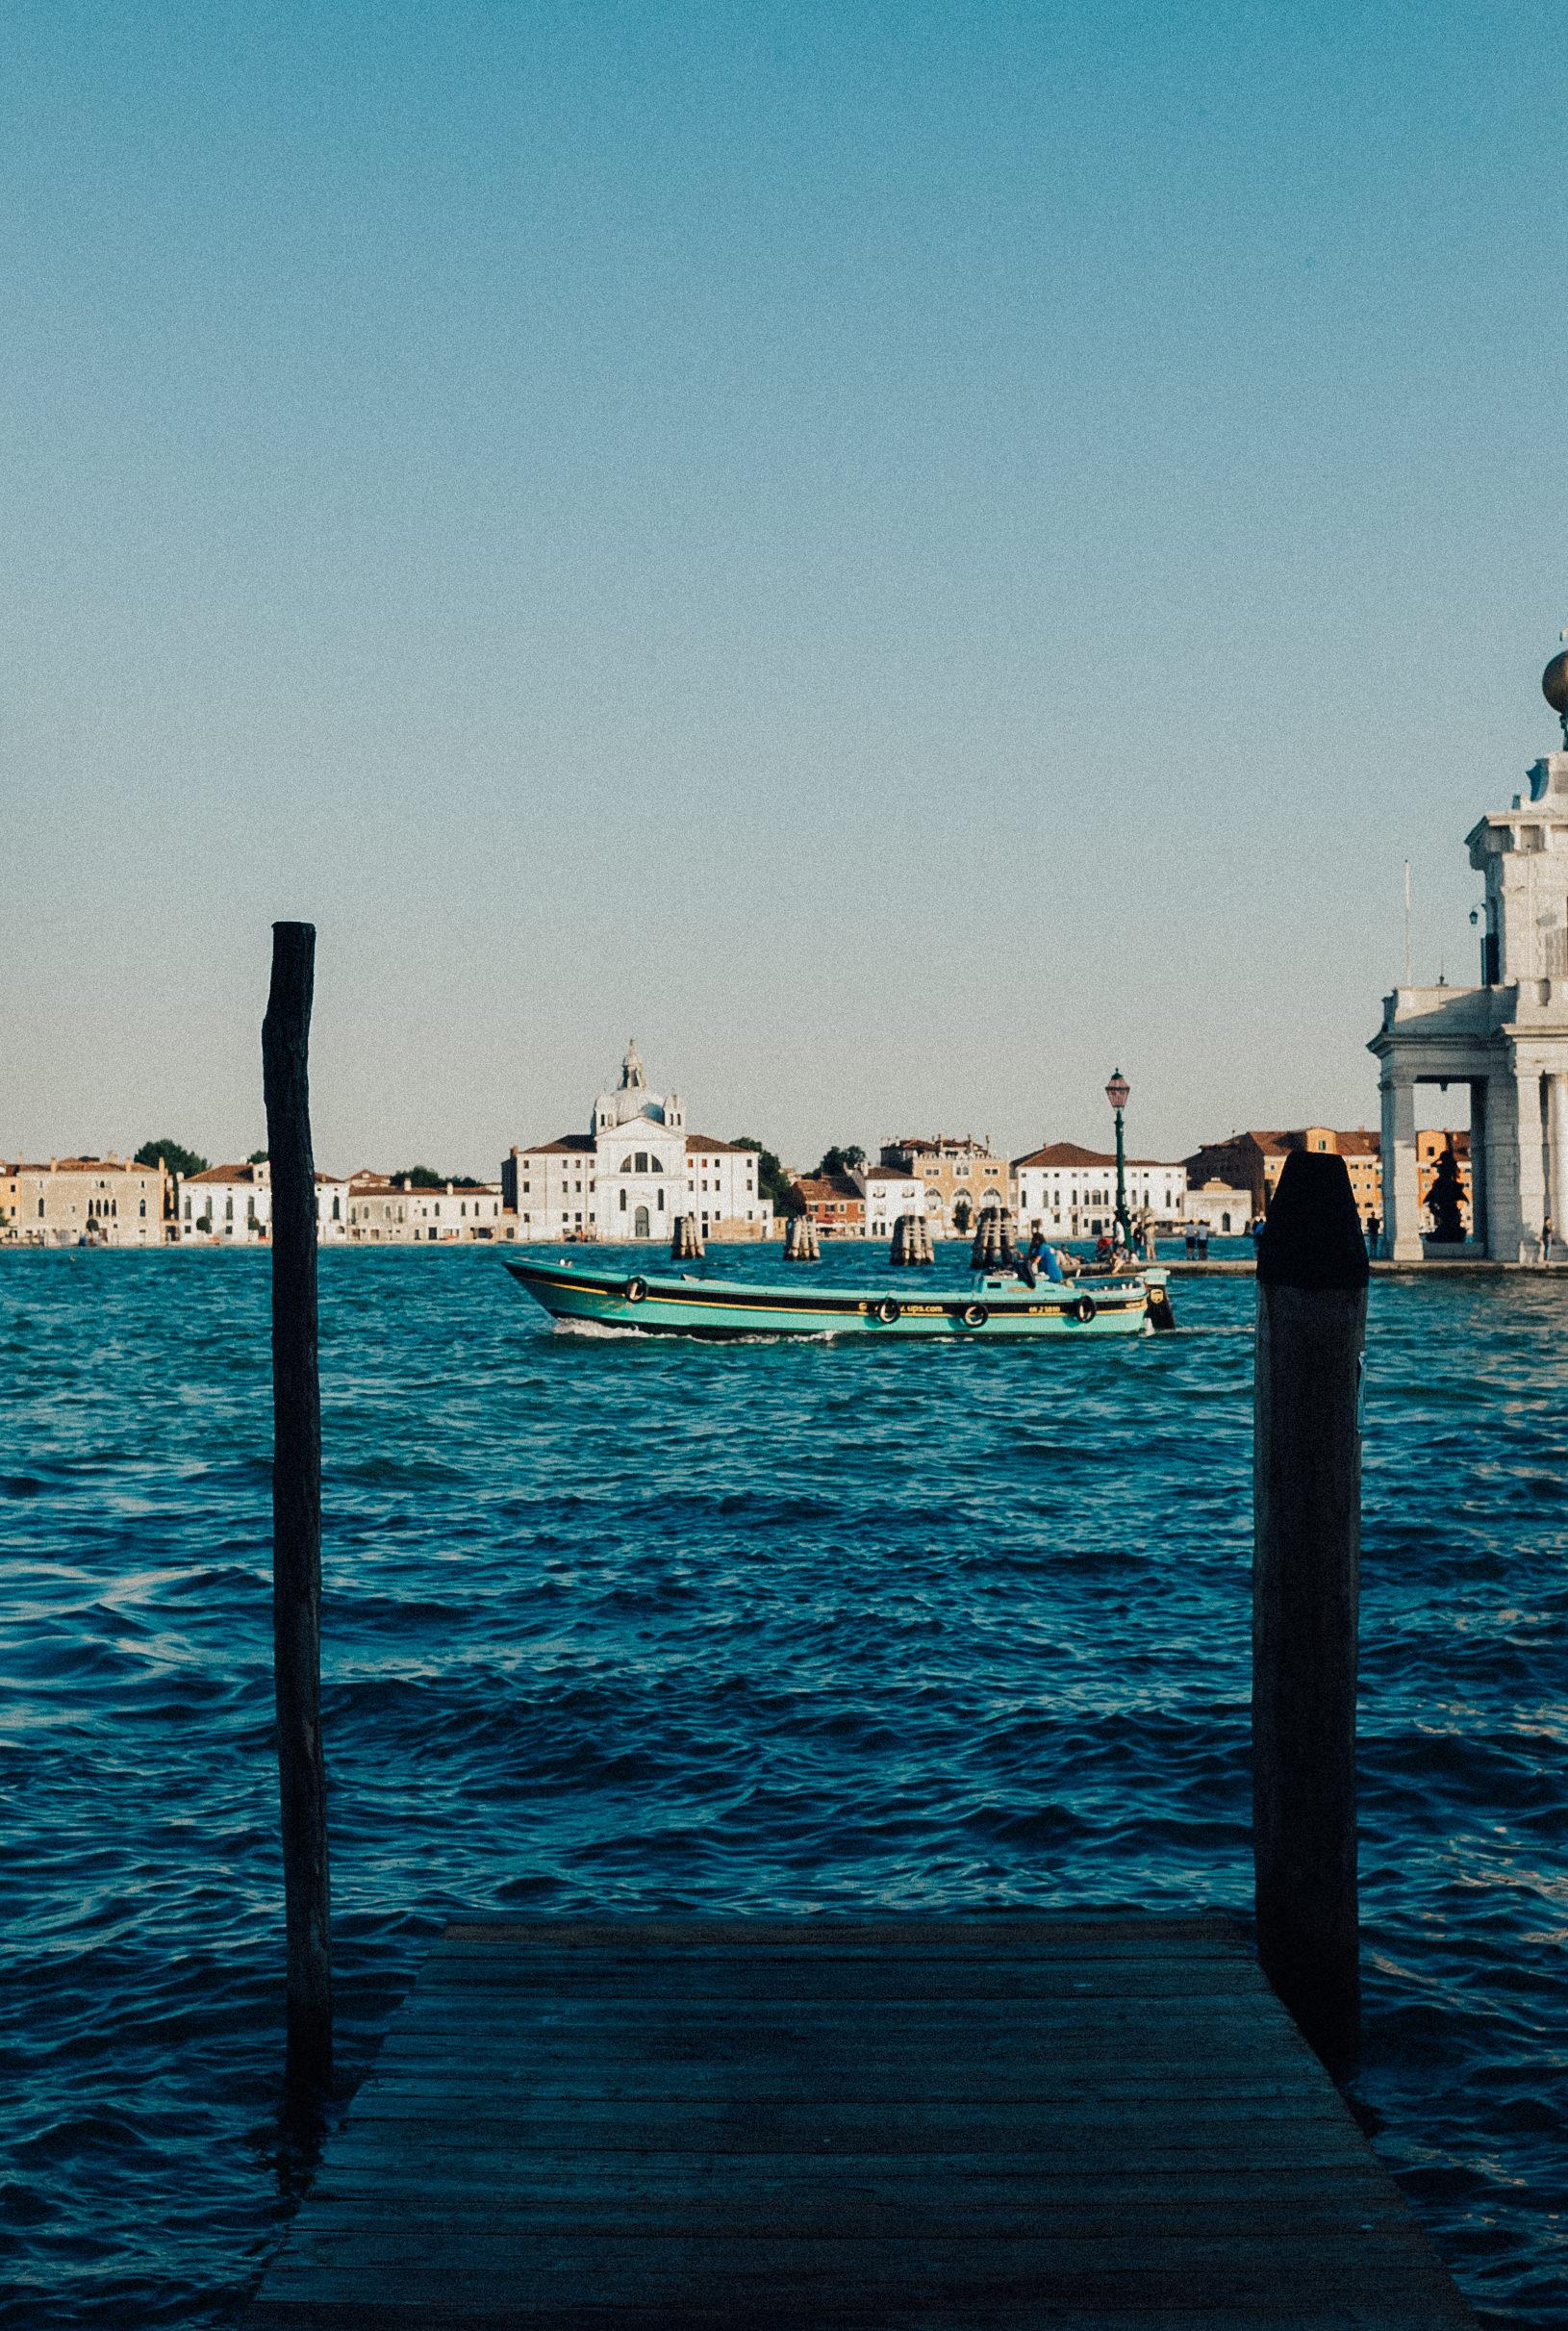 italy_travel_photography146.jpg